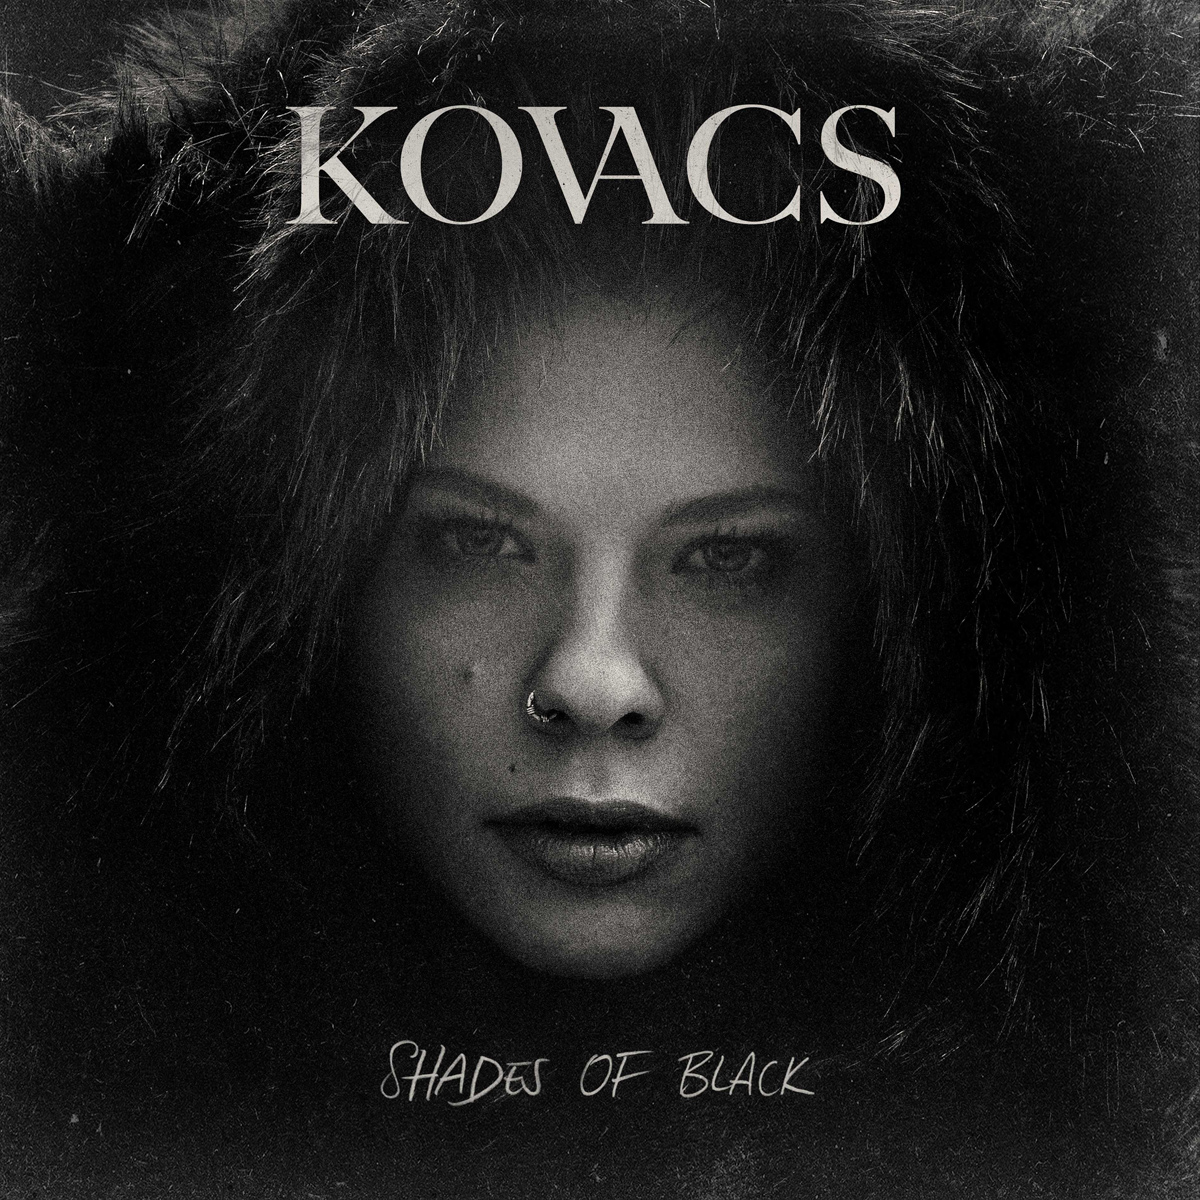 Kovacs+cover